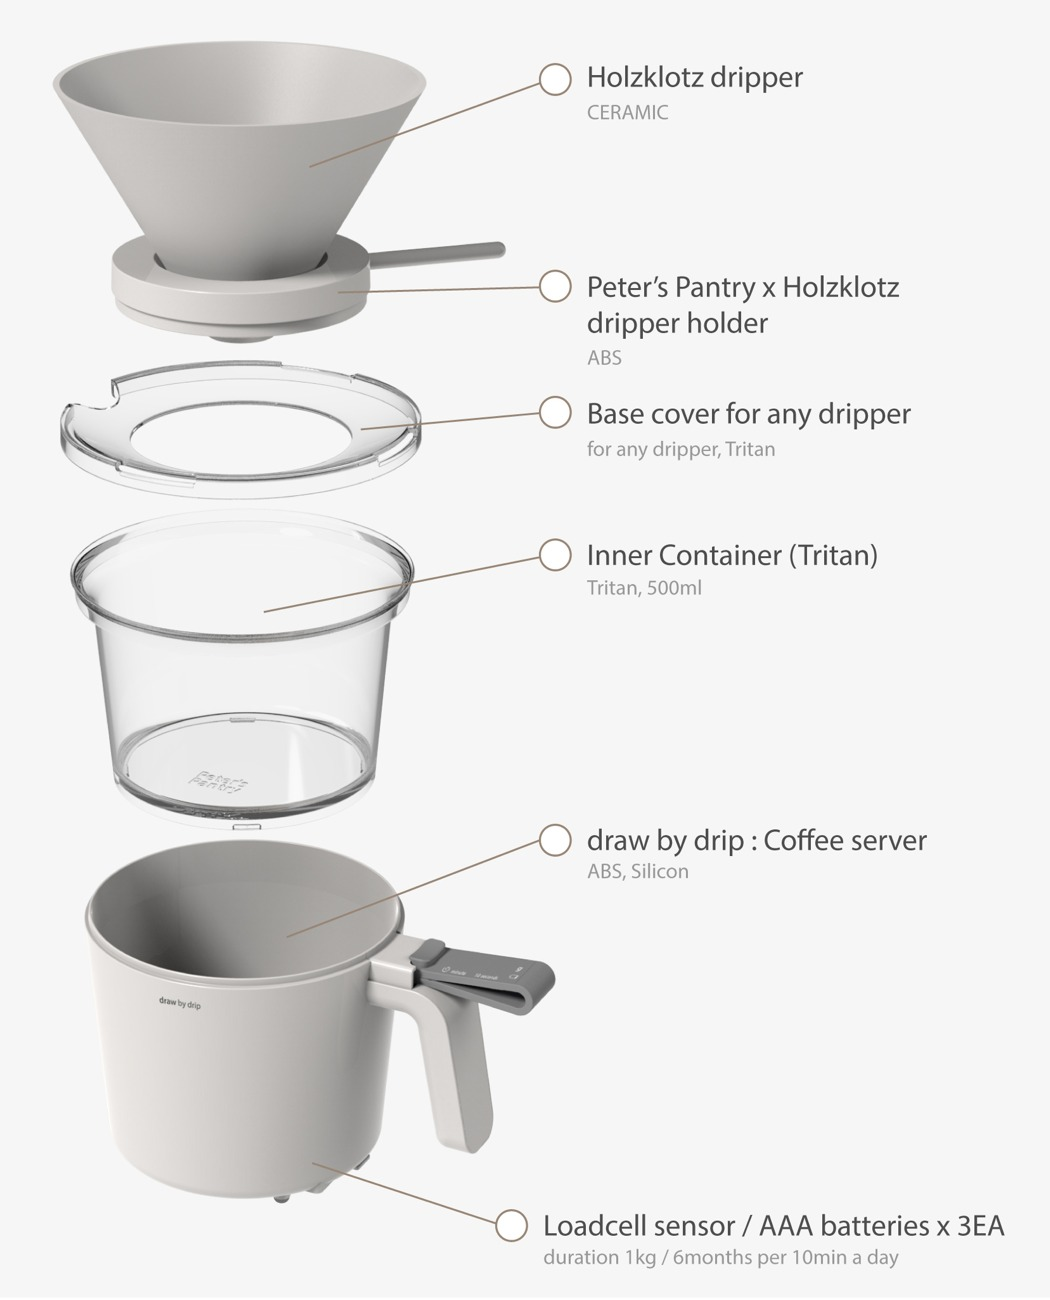 drawbydrip_coffee_server_05